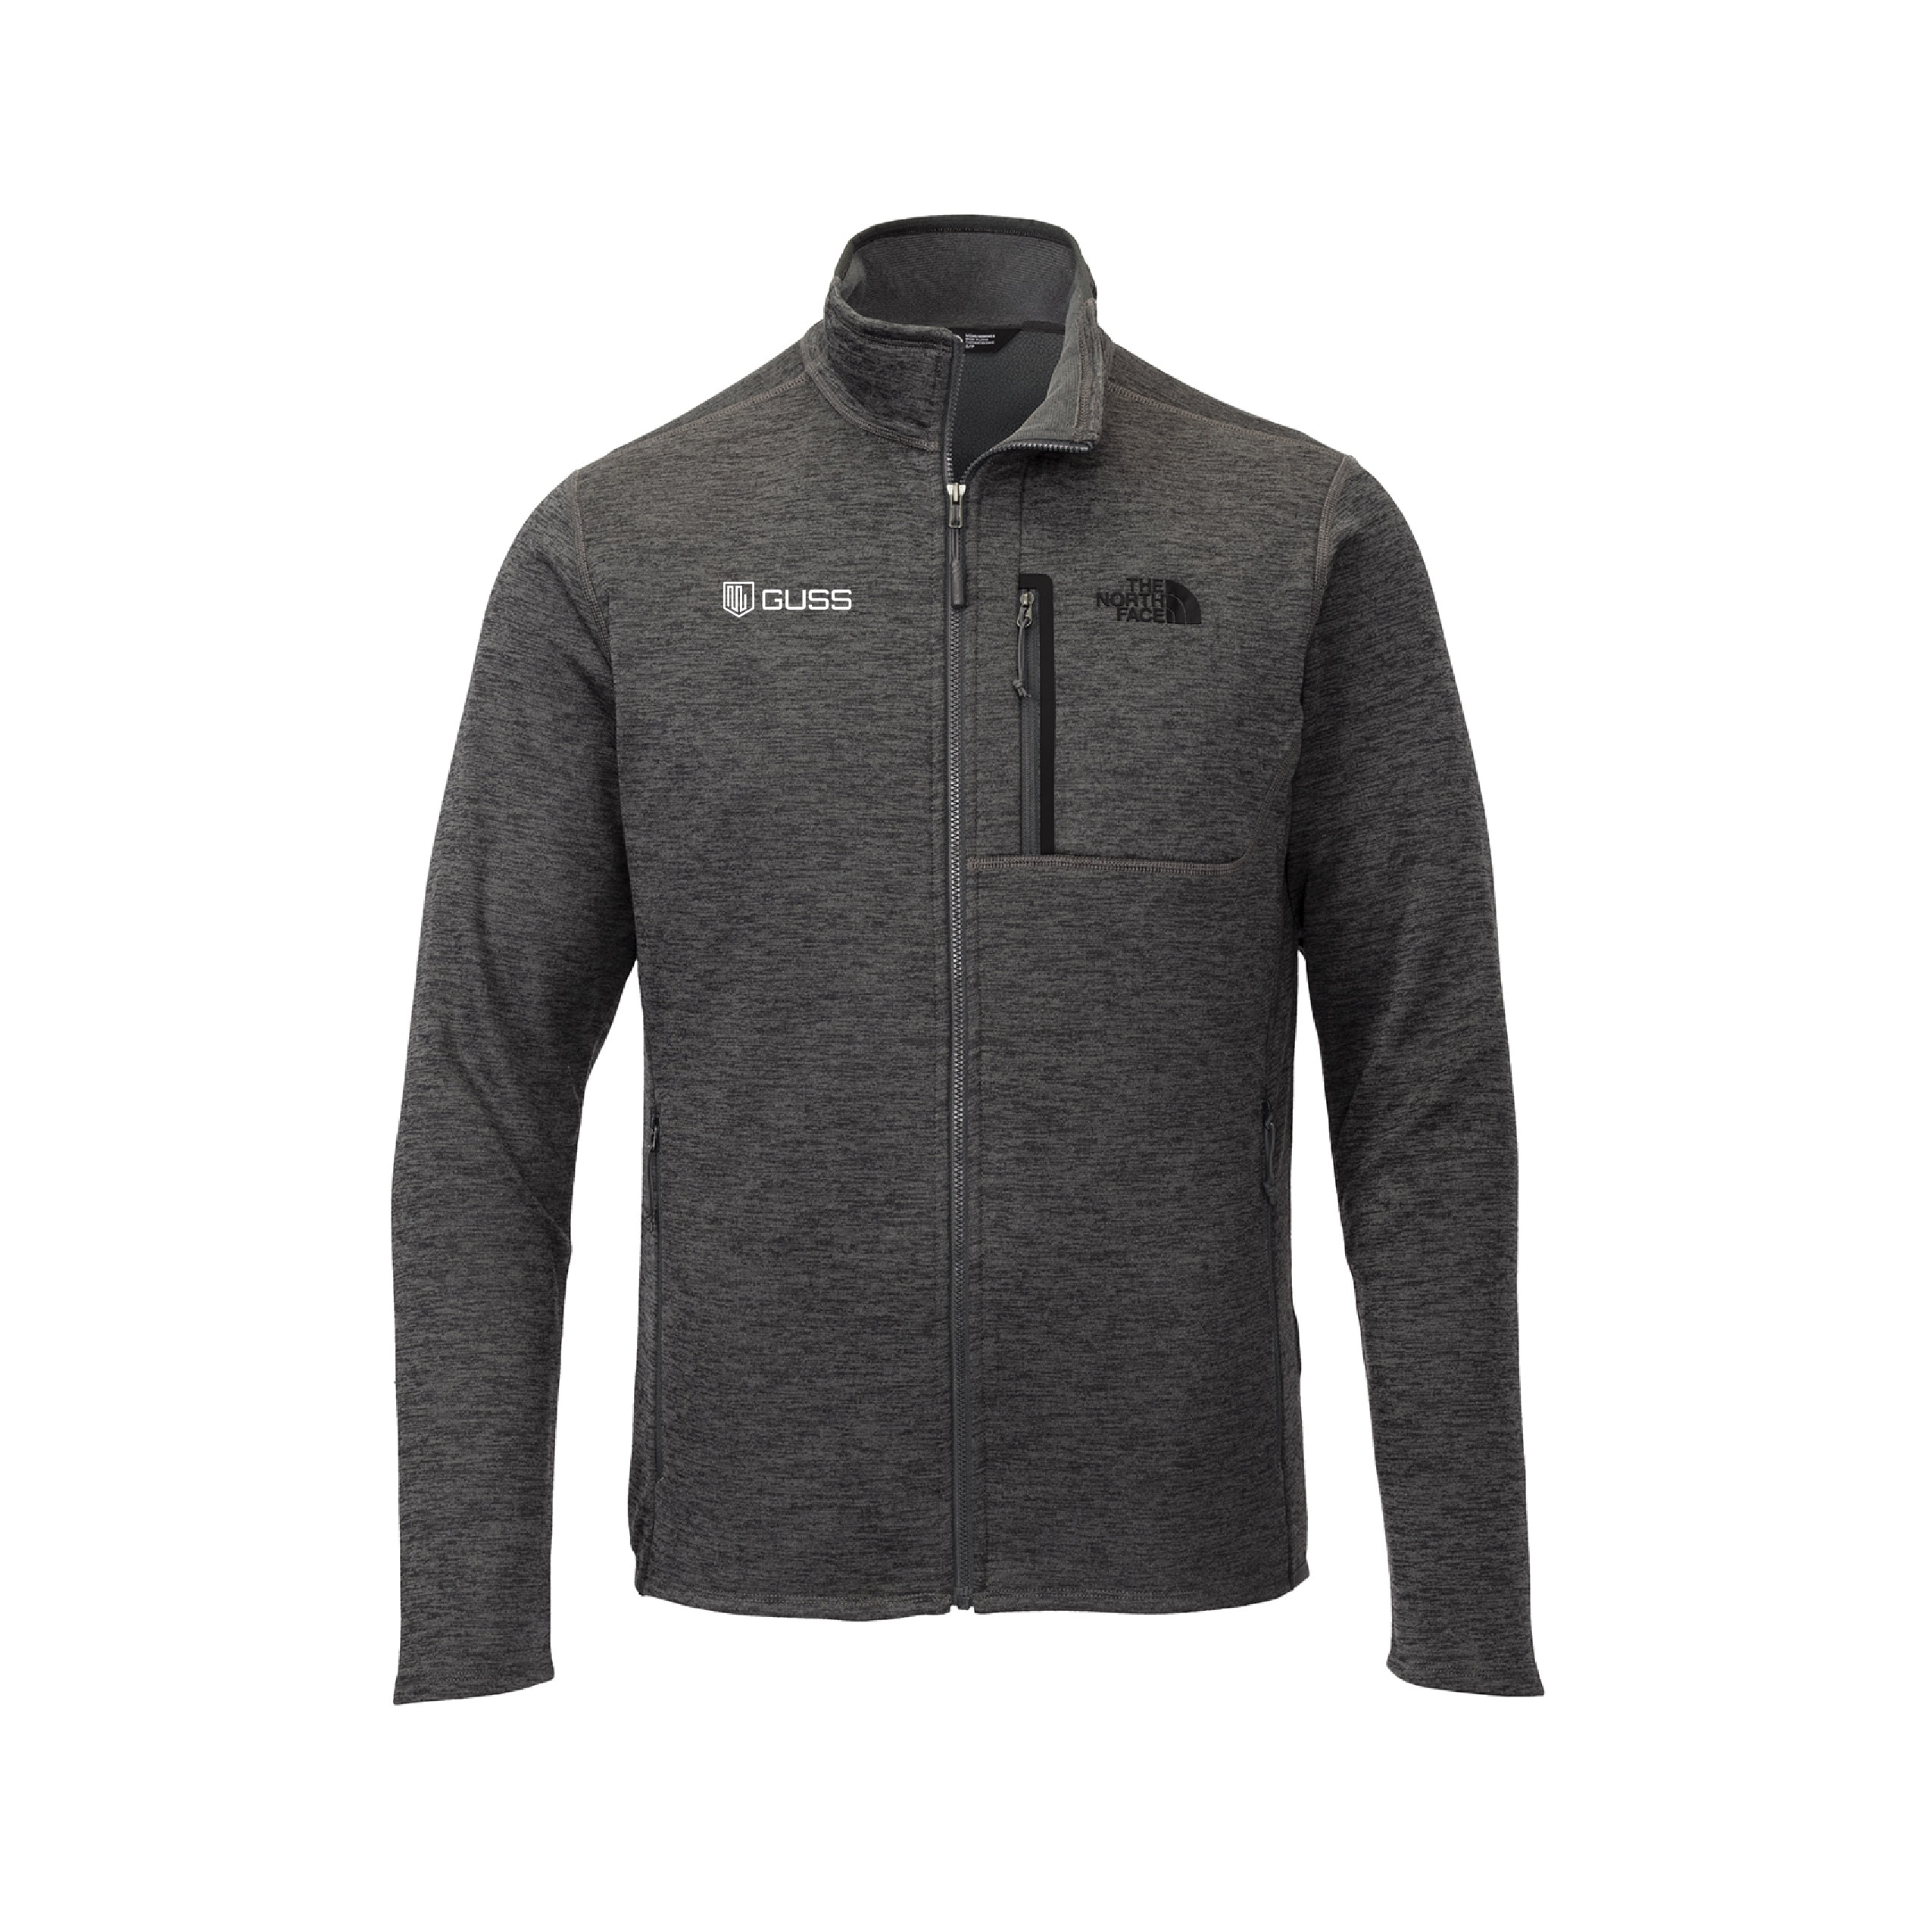 Mens Fleece Jacket - North Face Skyline Full-Zip